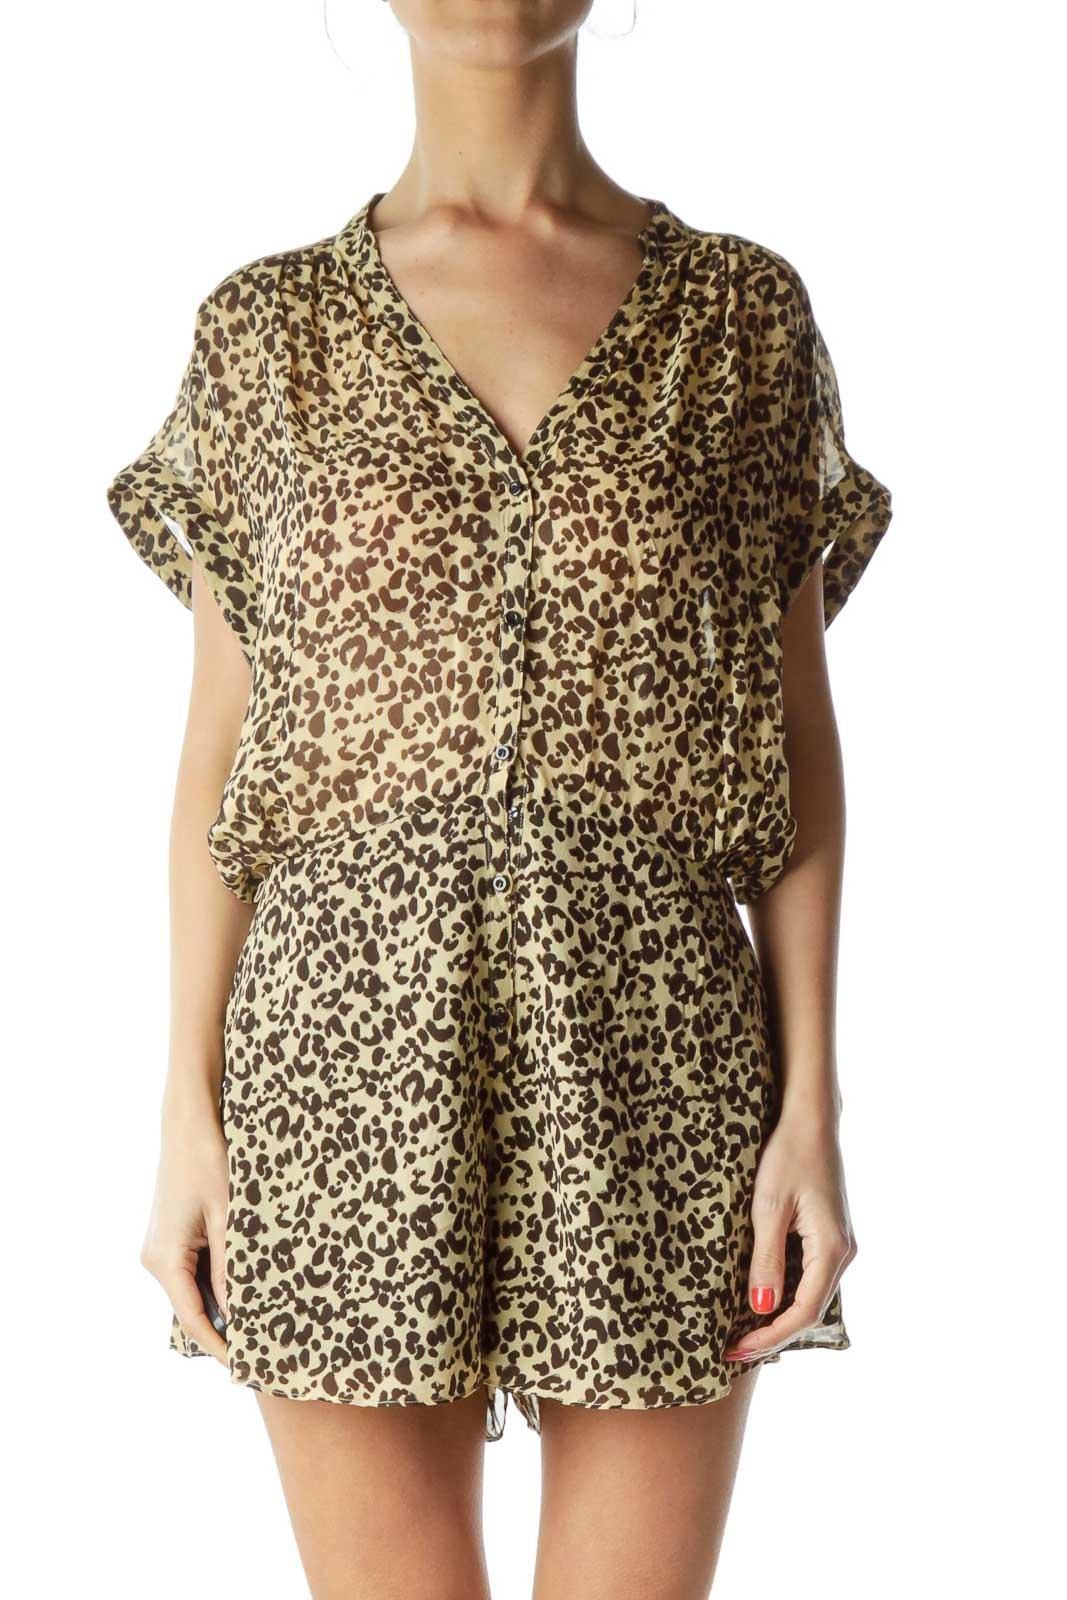 Leopard Print Sheer Romper Front